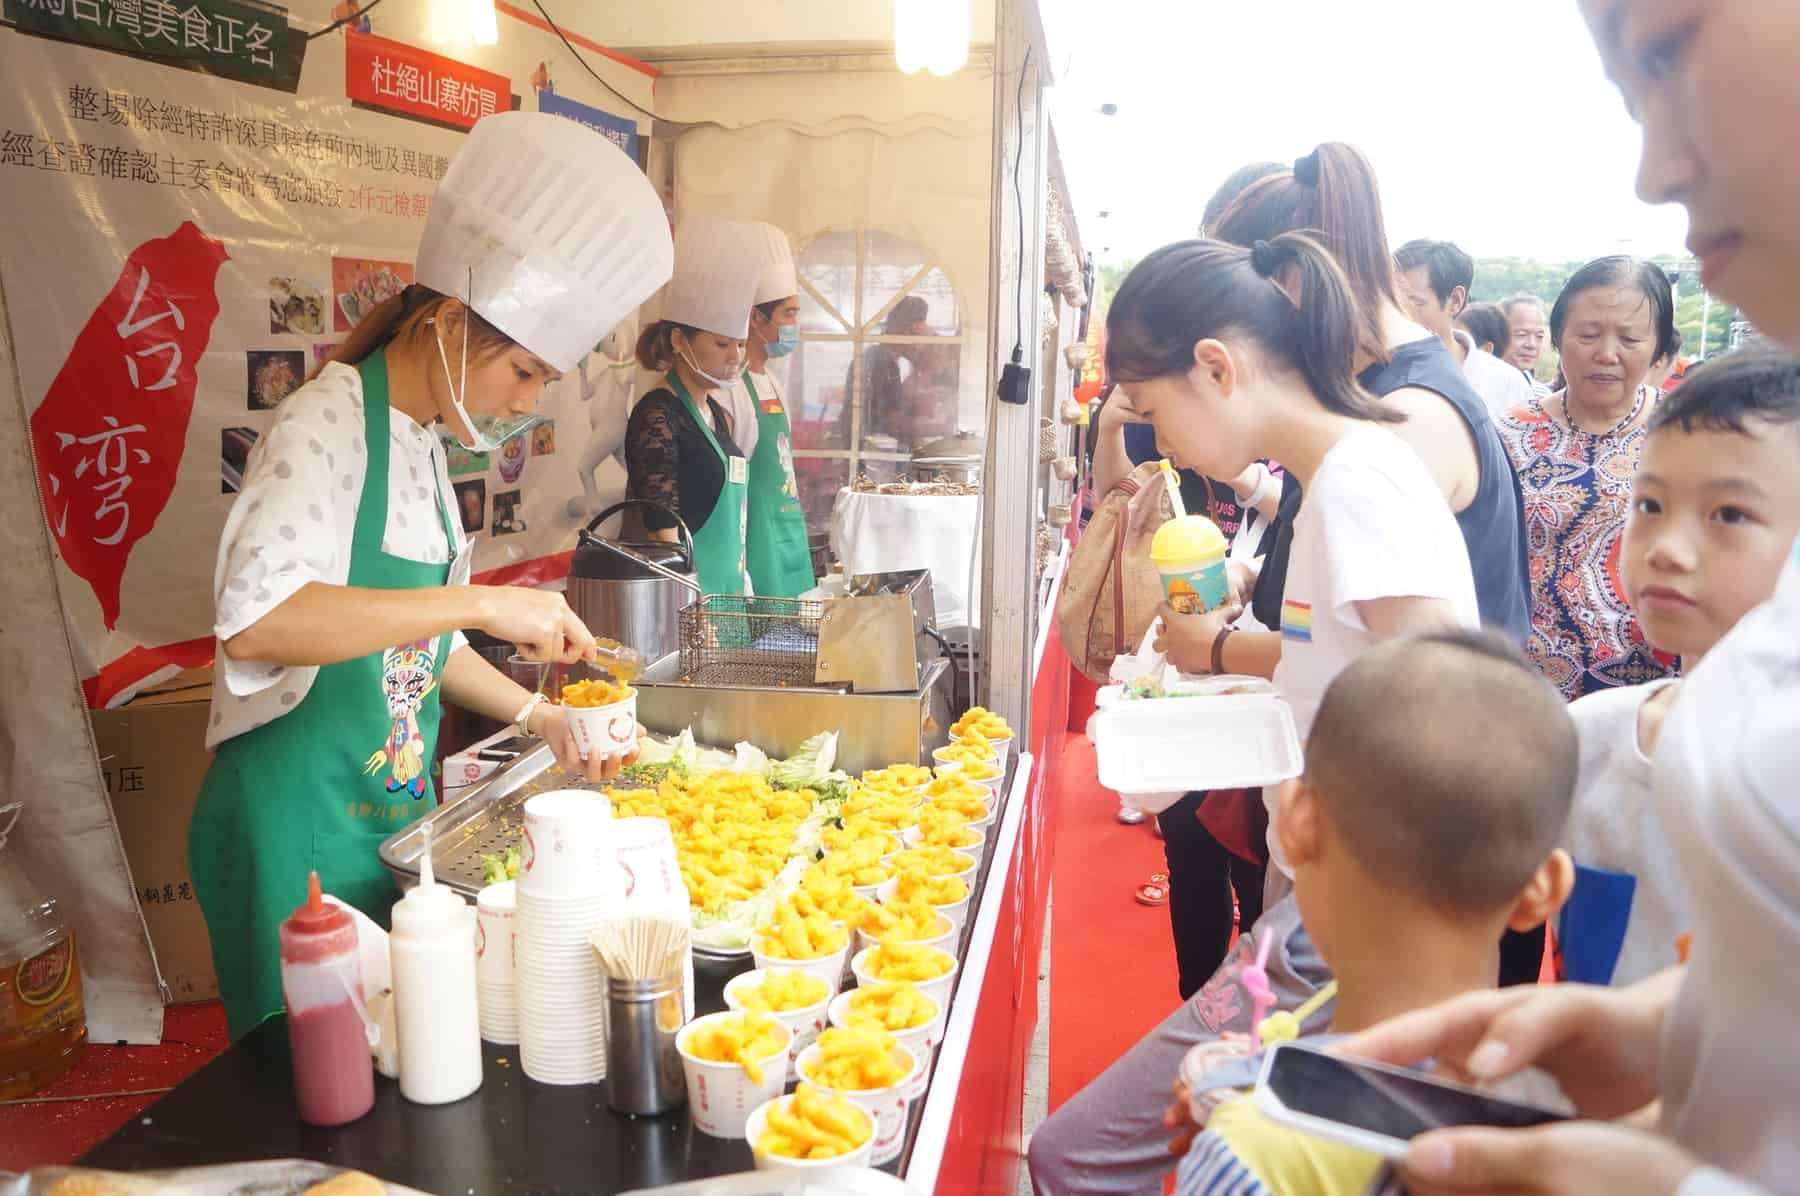 Taiwan food festival activities